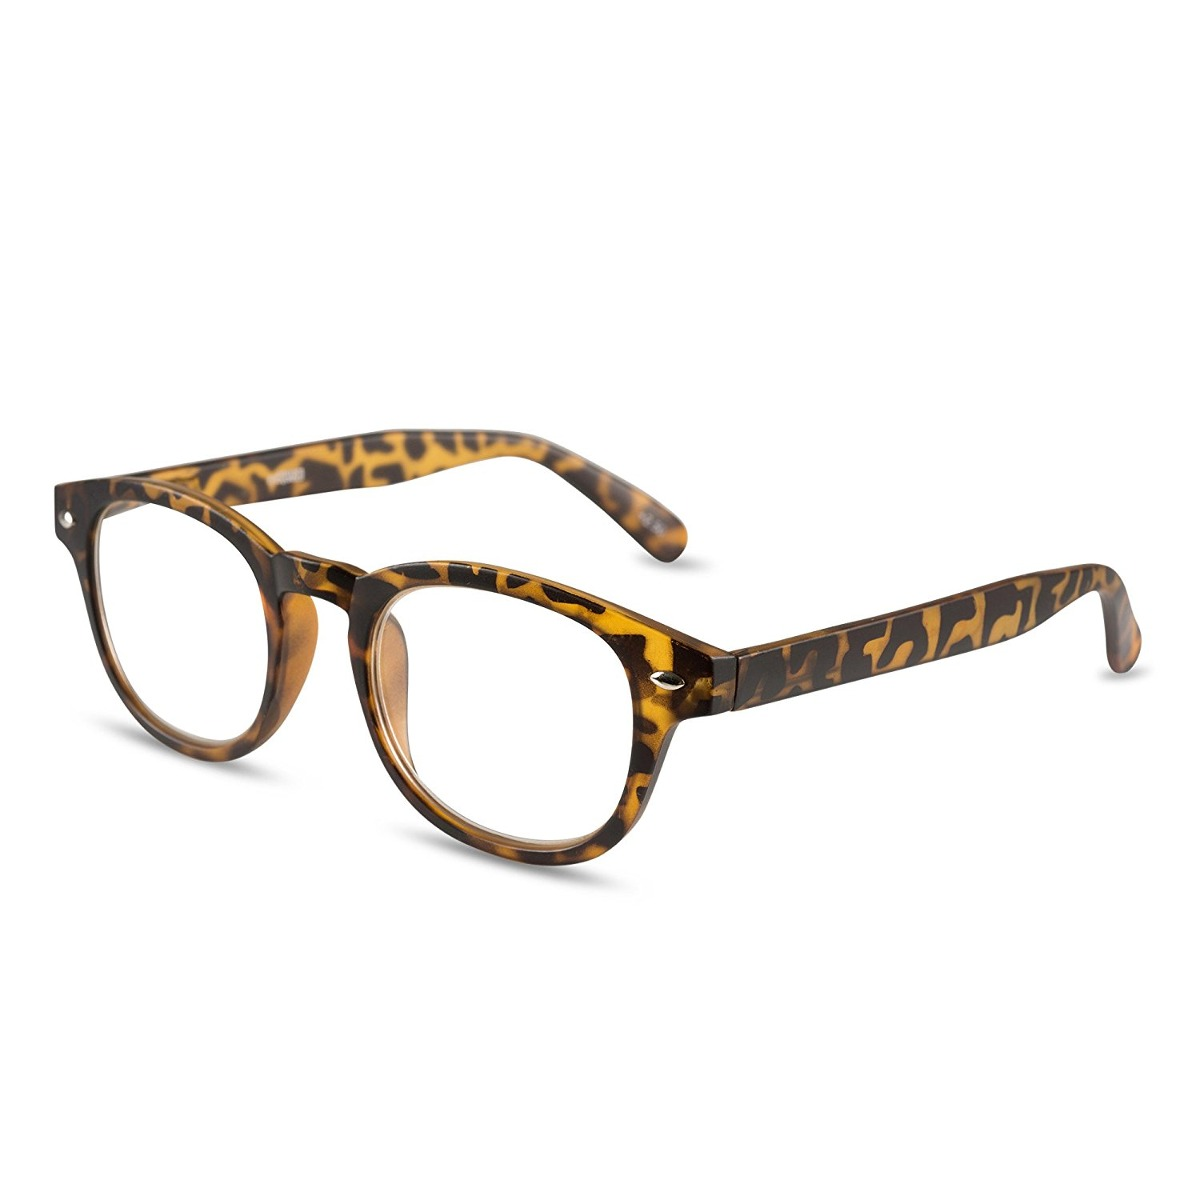 Eyesquared Gafas De Lectura - 3 Pack Marcos De Calidad, Mate ...